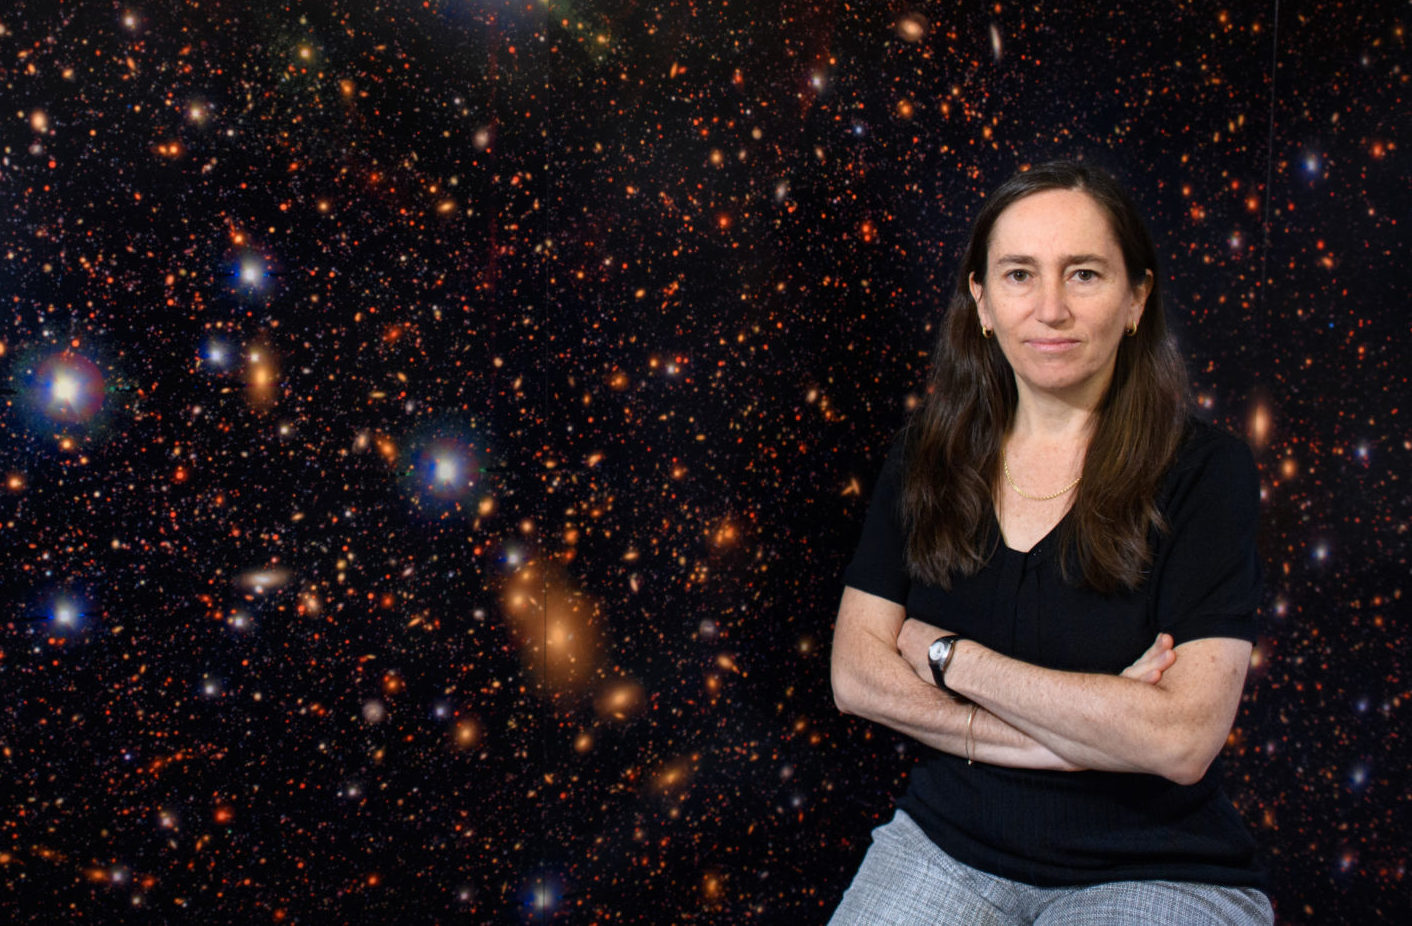 Astrophysicist Eve Ostriker